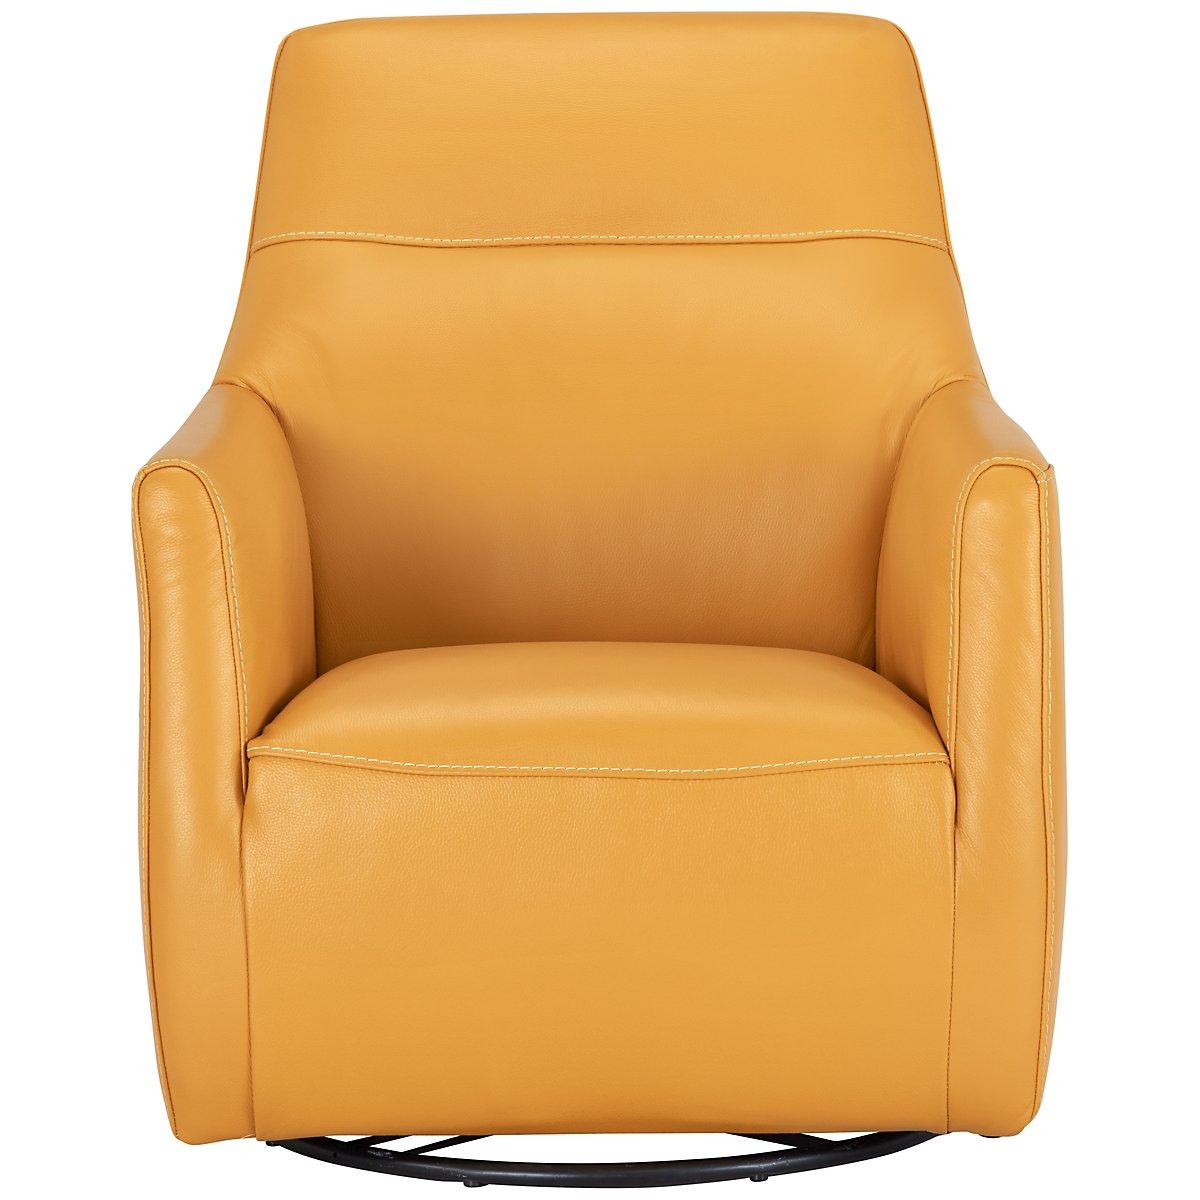 city furniture izzy yellow leather swivel accent chair - izzy yellow leather swivel accent chair